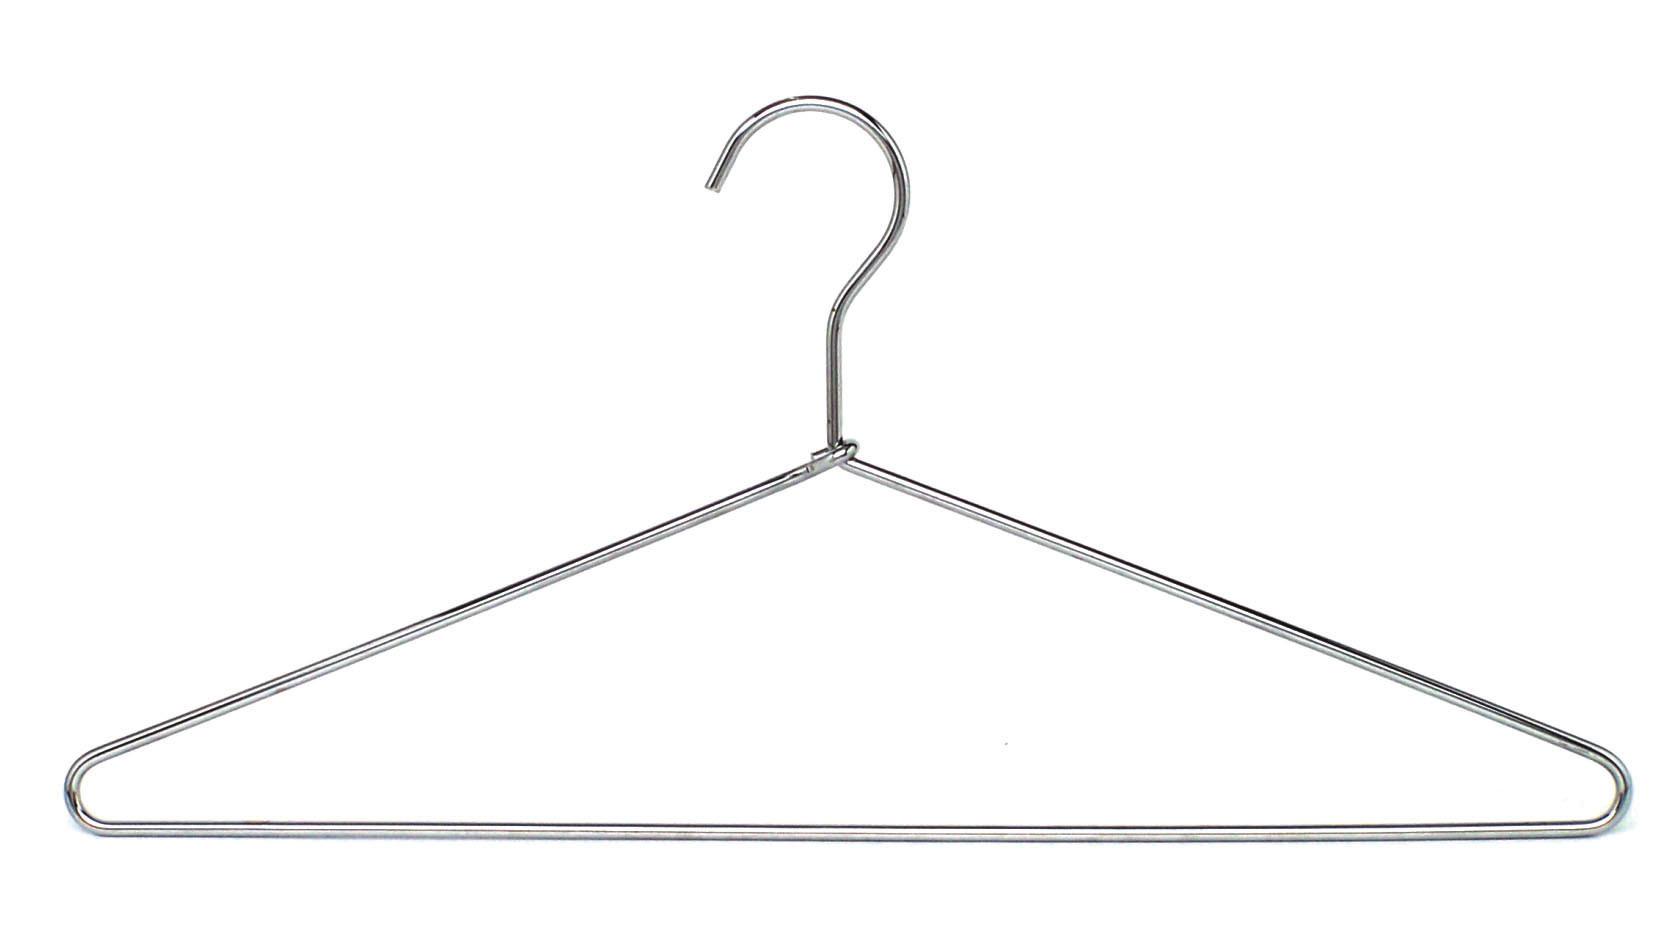 China Metal Hanger Laundry Hanger